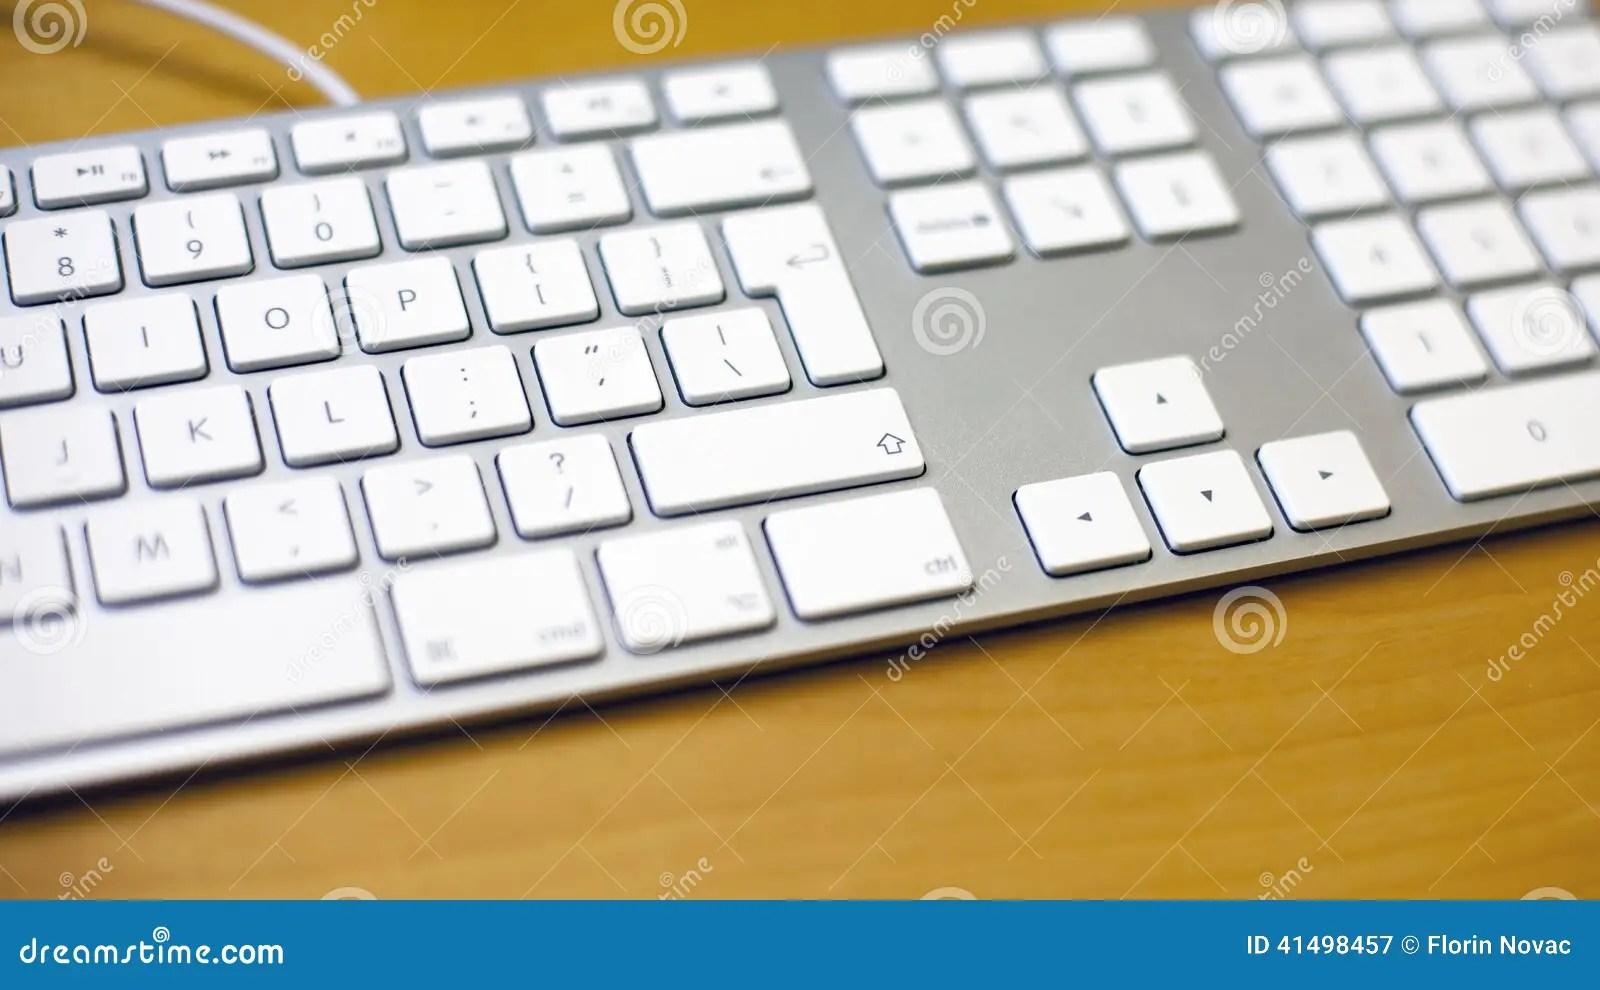 Aluminum Blank Keyboard On Wooden Desk Stock Image